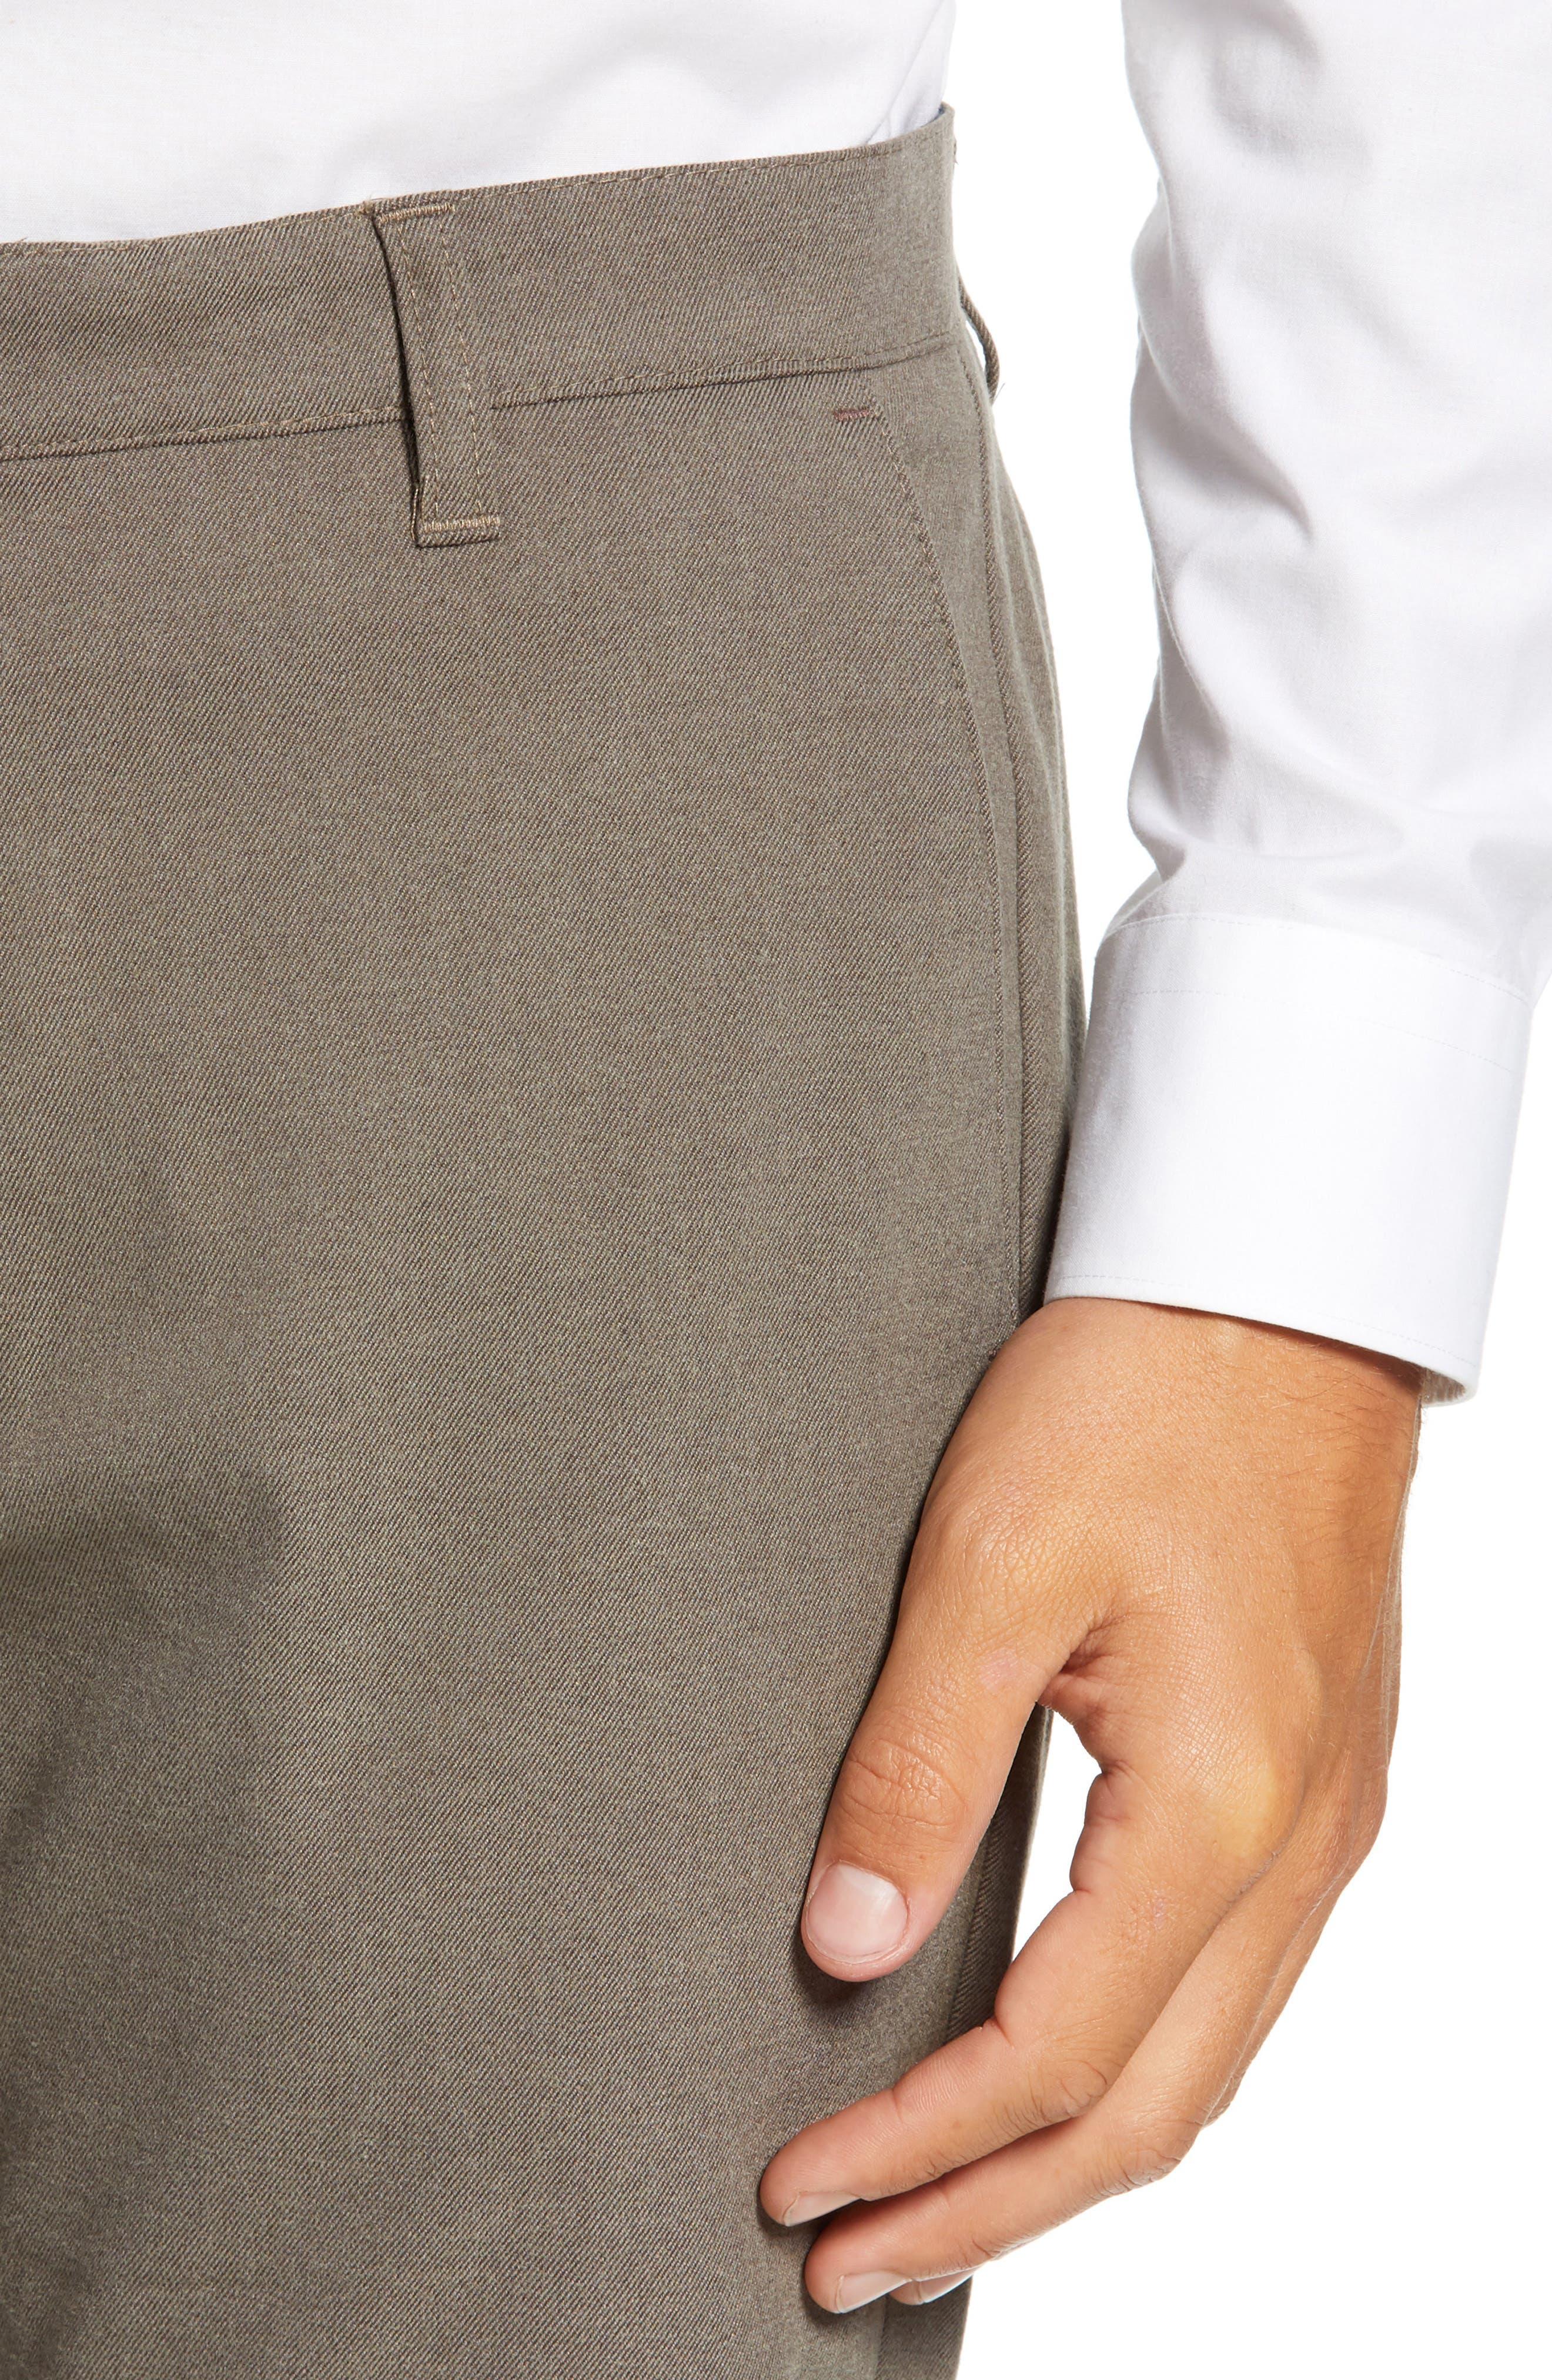 Semplin Slim Fit Brushed Trousers,                             Alternate thumbnail 4, color,                             NATURAL